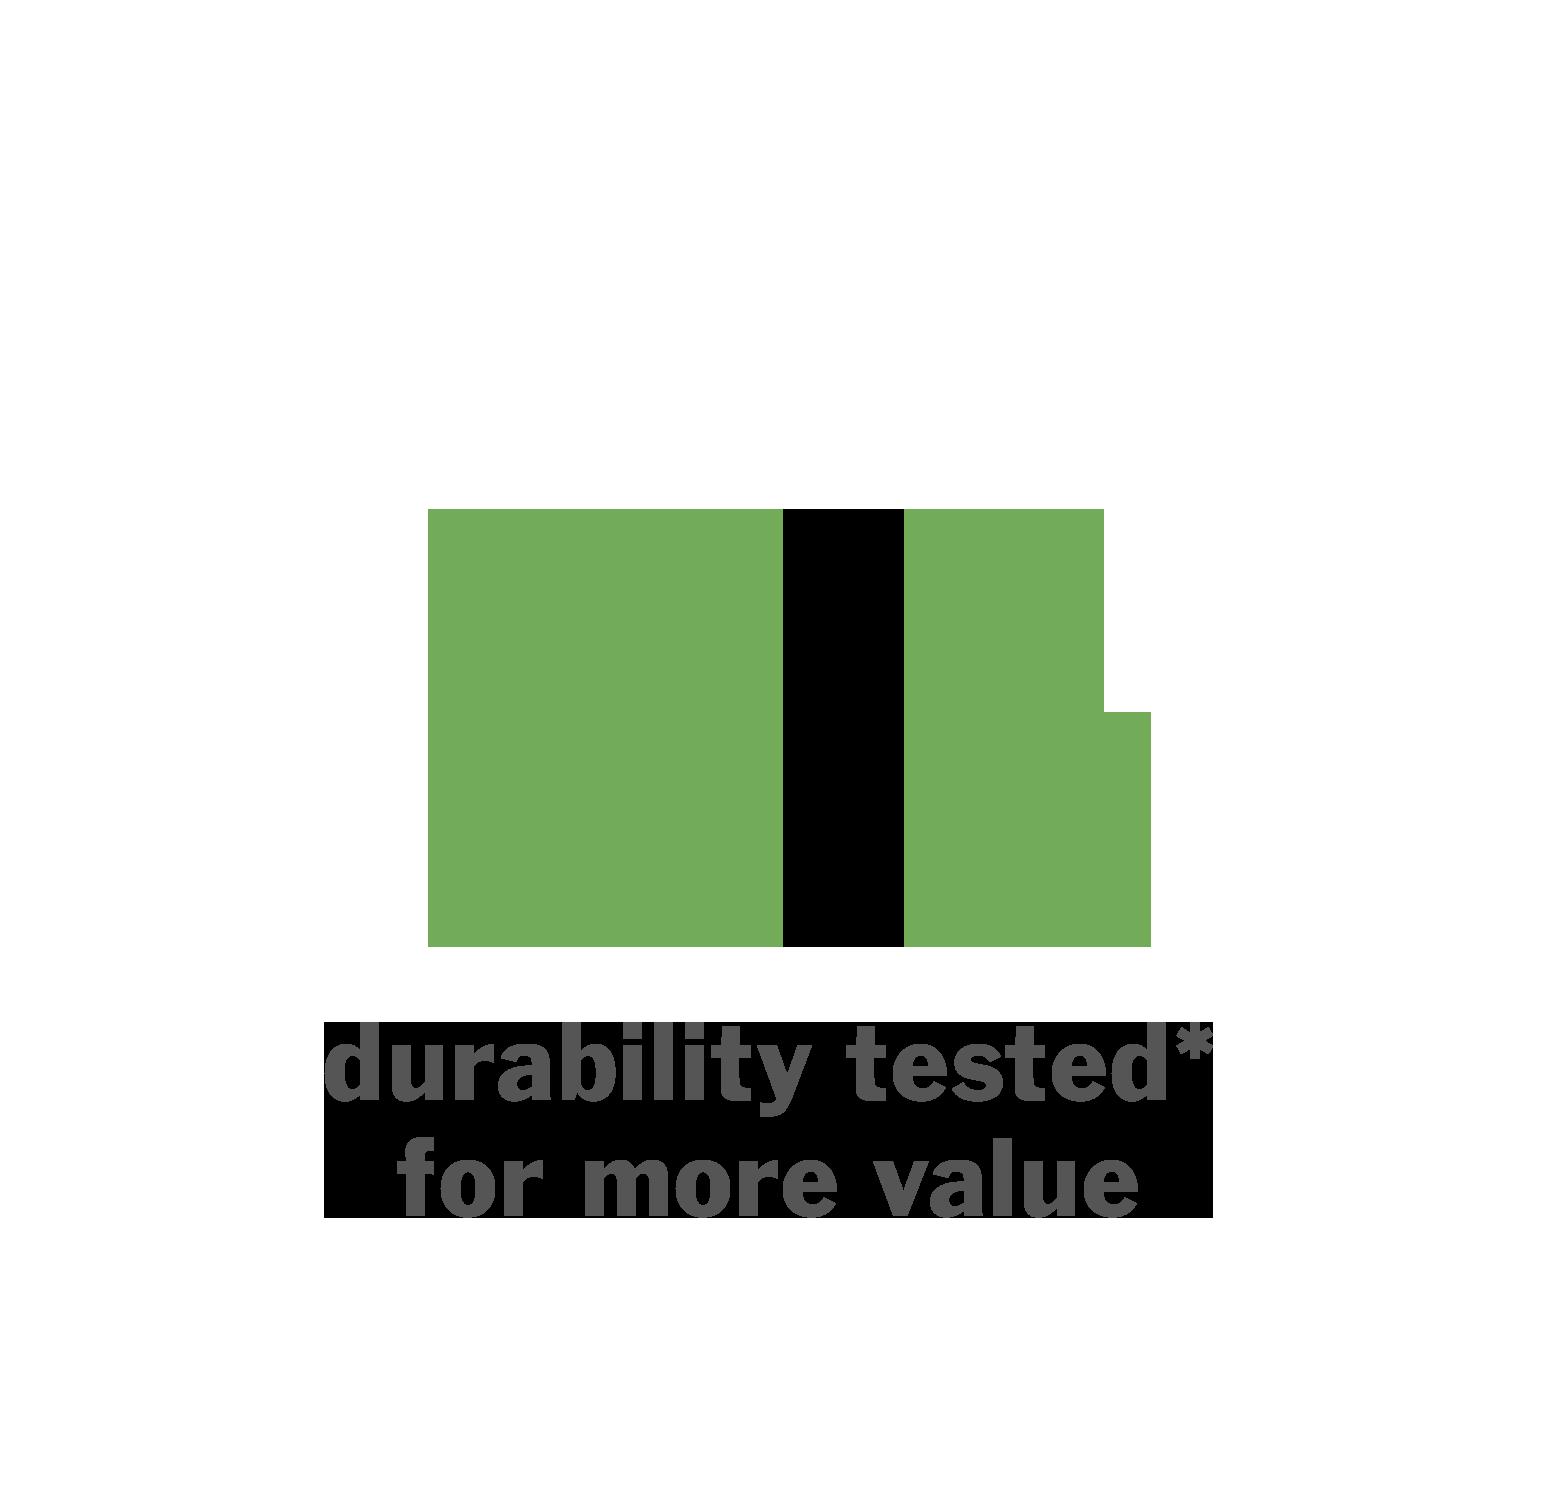 "#1 rank in ""Fraunhofer PV Durability Initiative for Solar Modules: Part 3"". PVTech Power Magazine, 2015. Campeau, Z. et al. ""SunPower Module Degradation Rate,"" SunPower white paper, 2013."